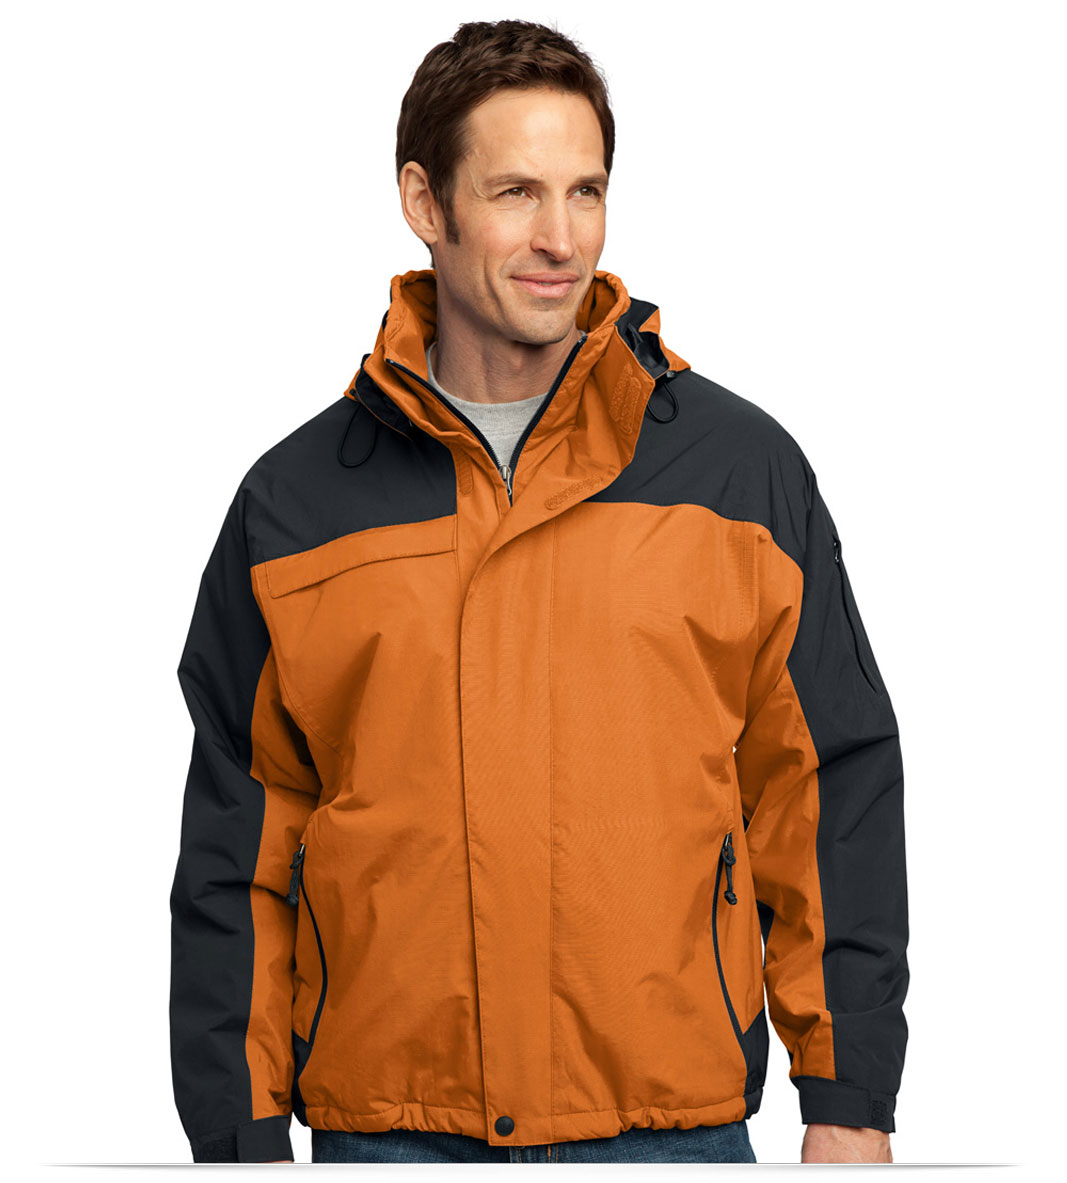 Custom Nootka Jacket